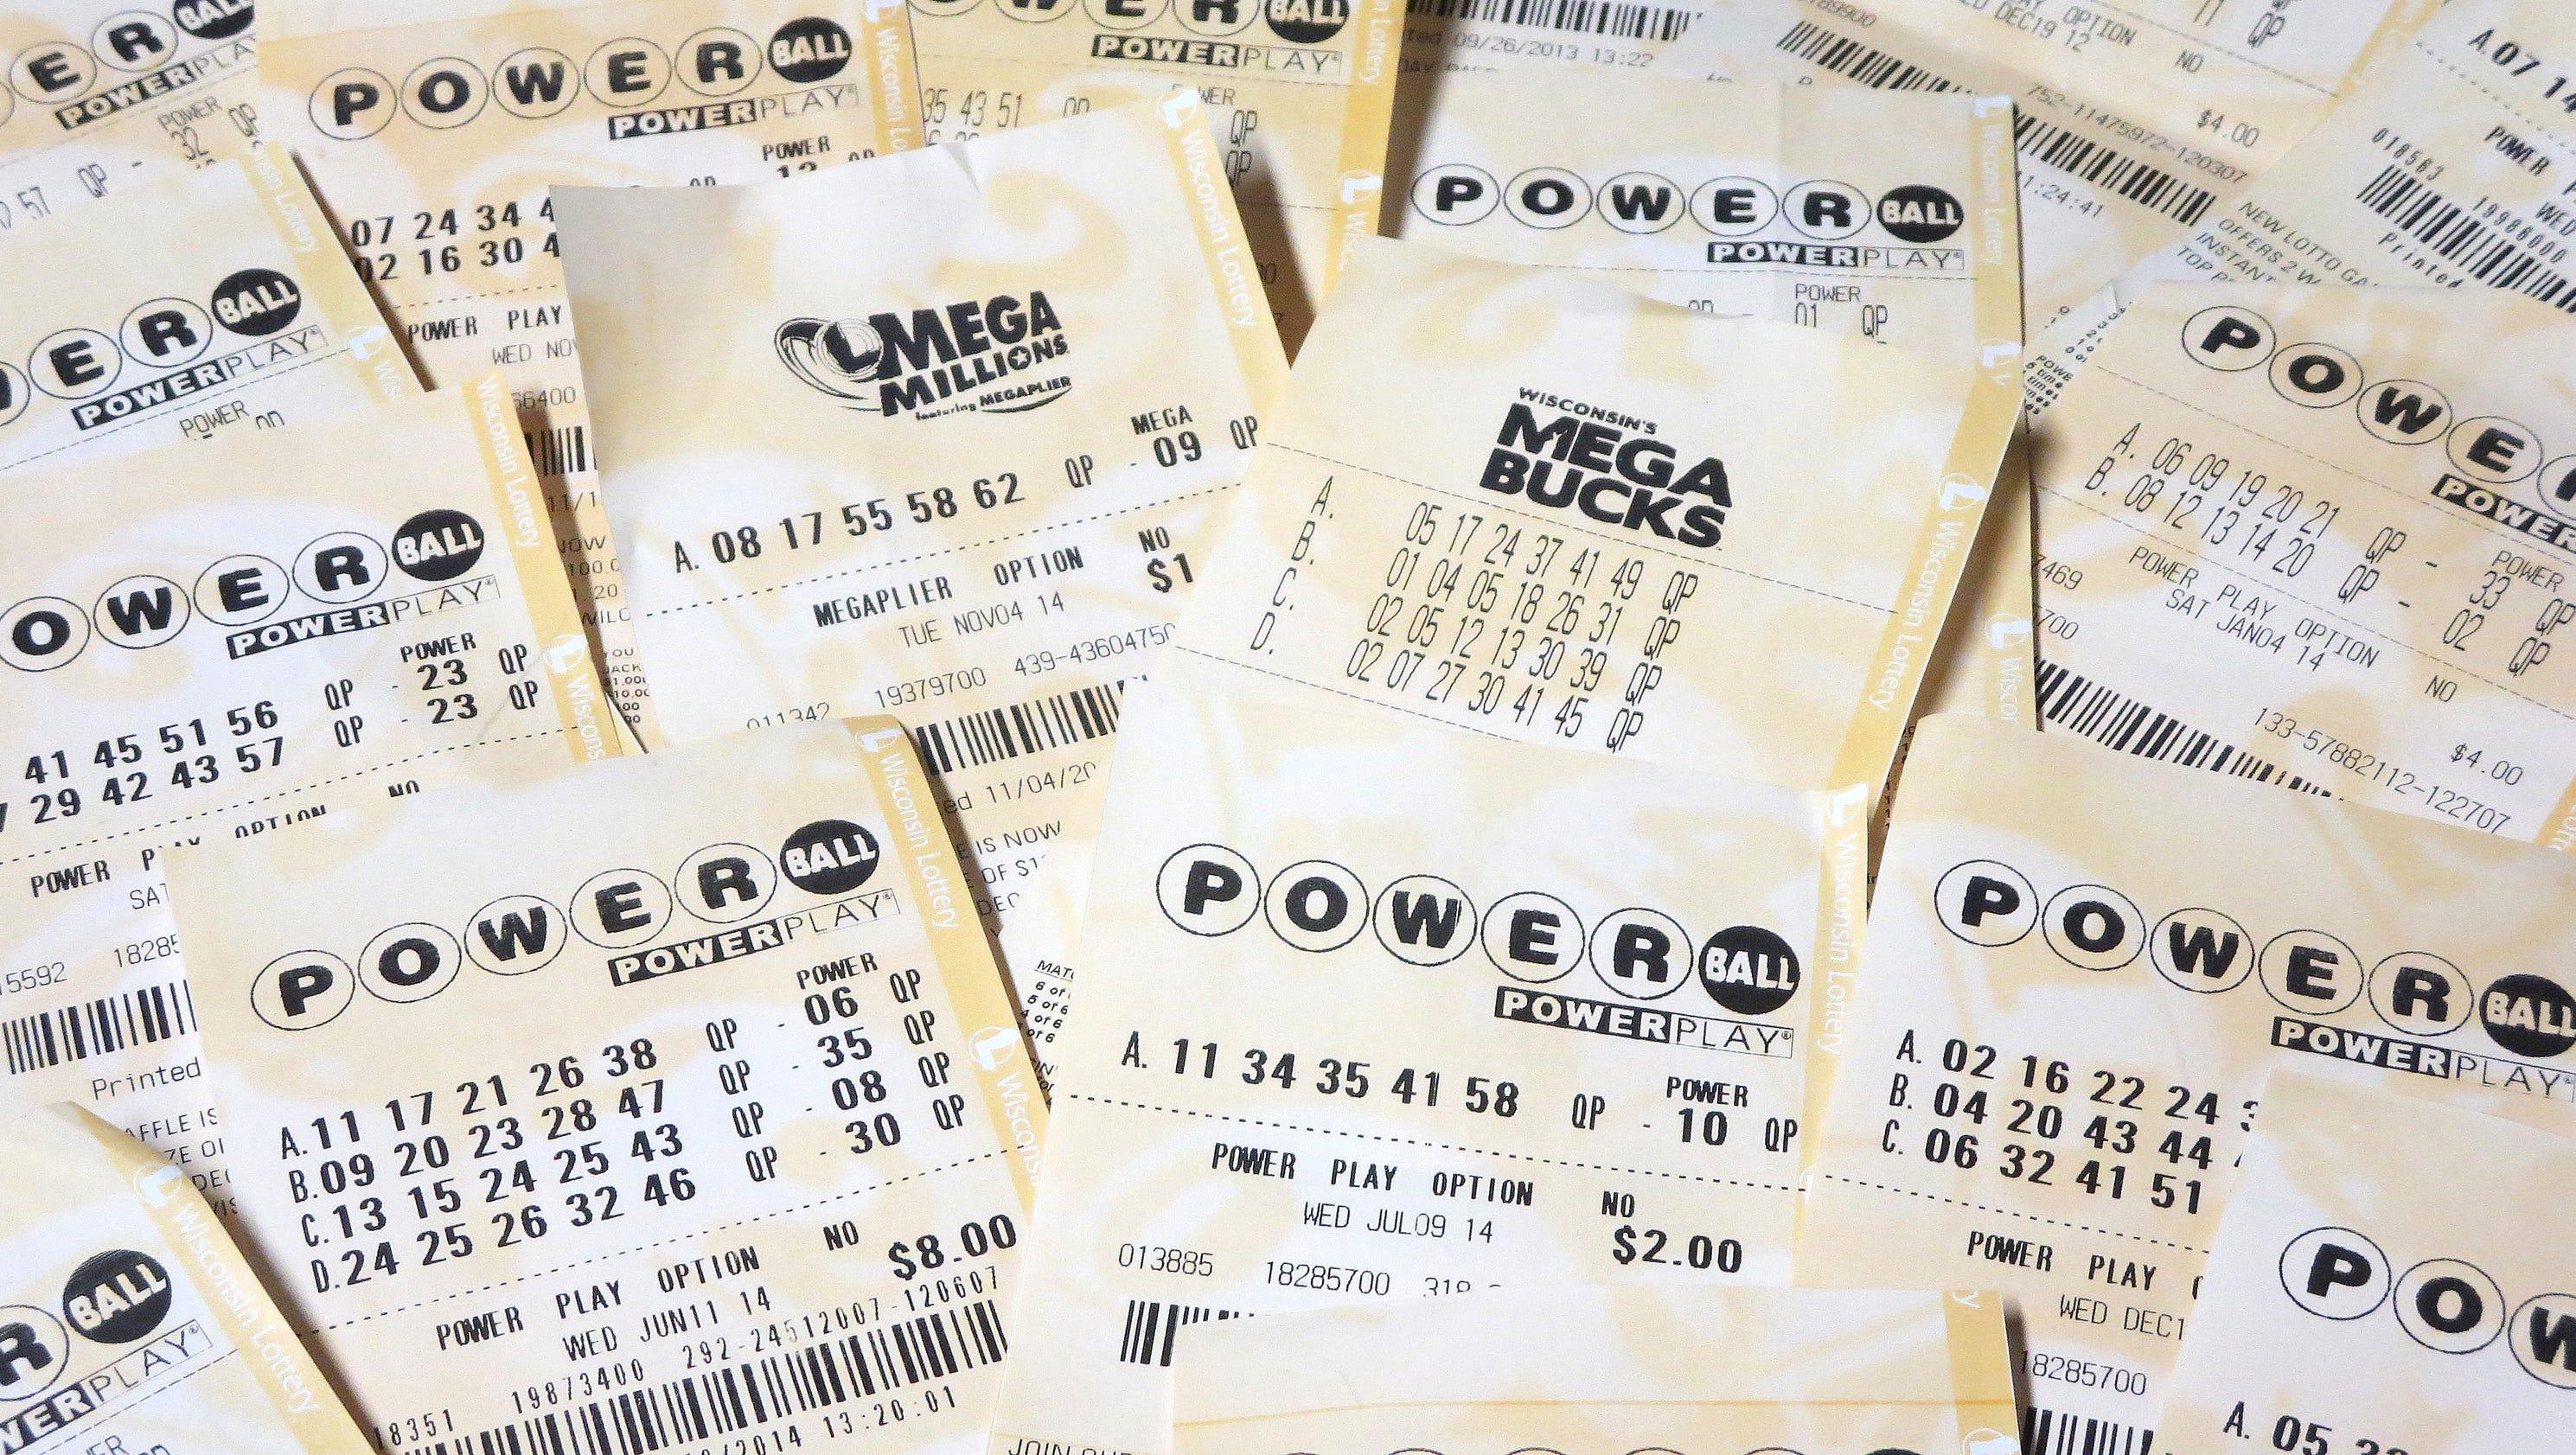 lotto tickets expire